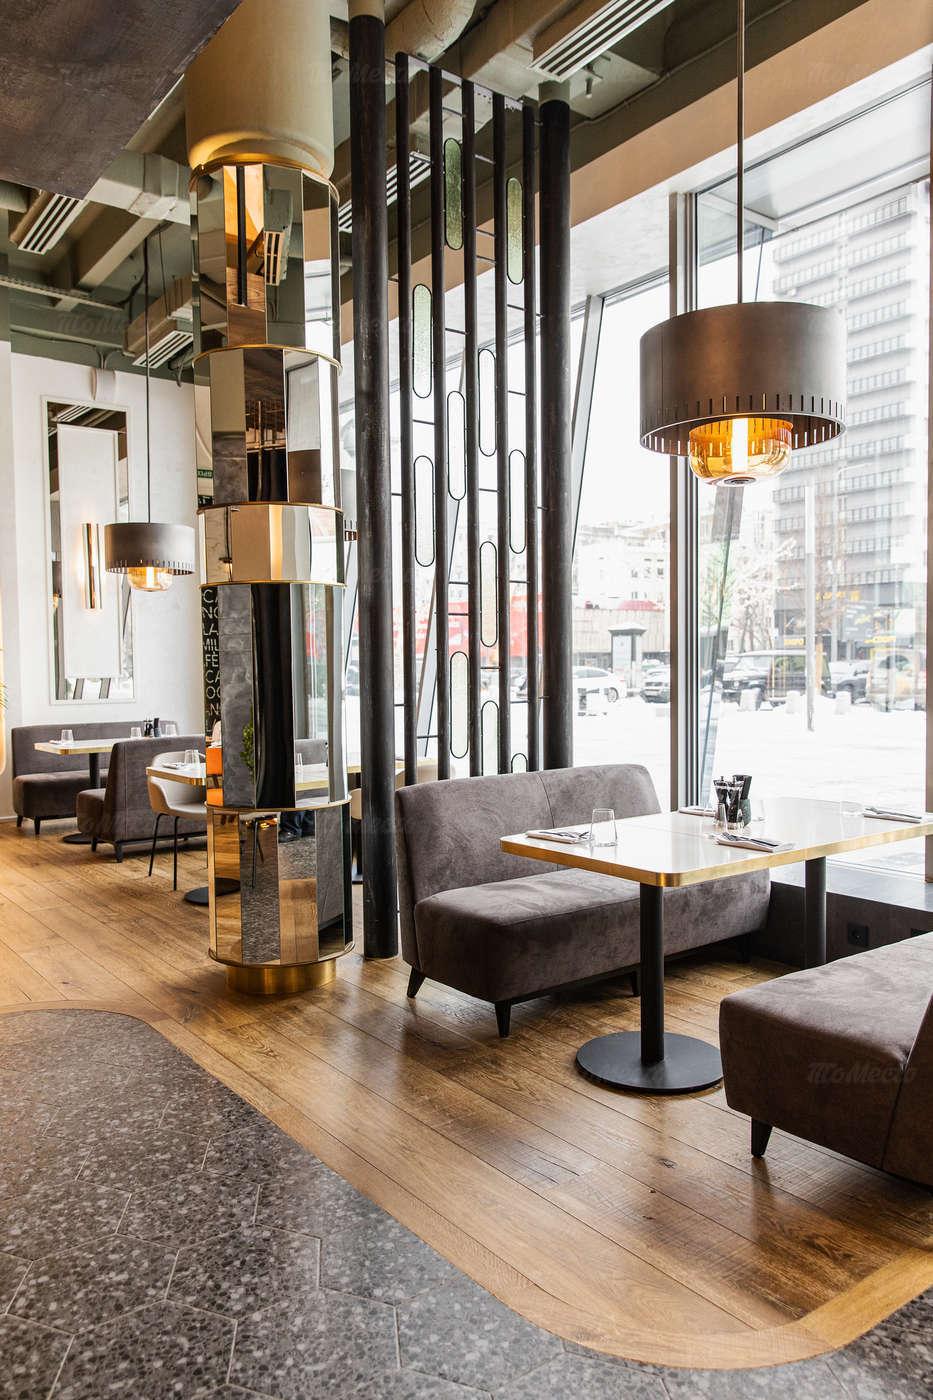 Ресторан Cafe Milano (Милано) на Новом Арбате фото 5